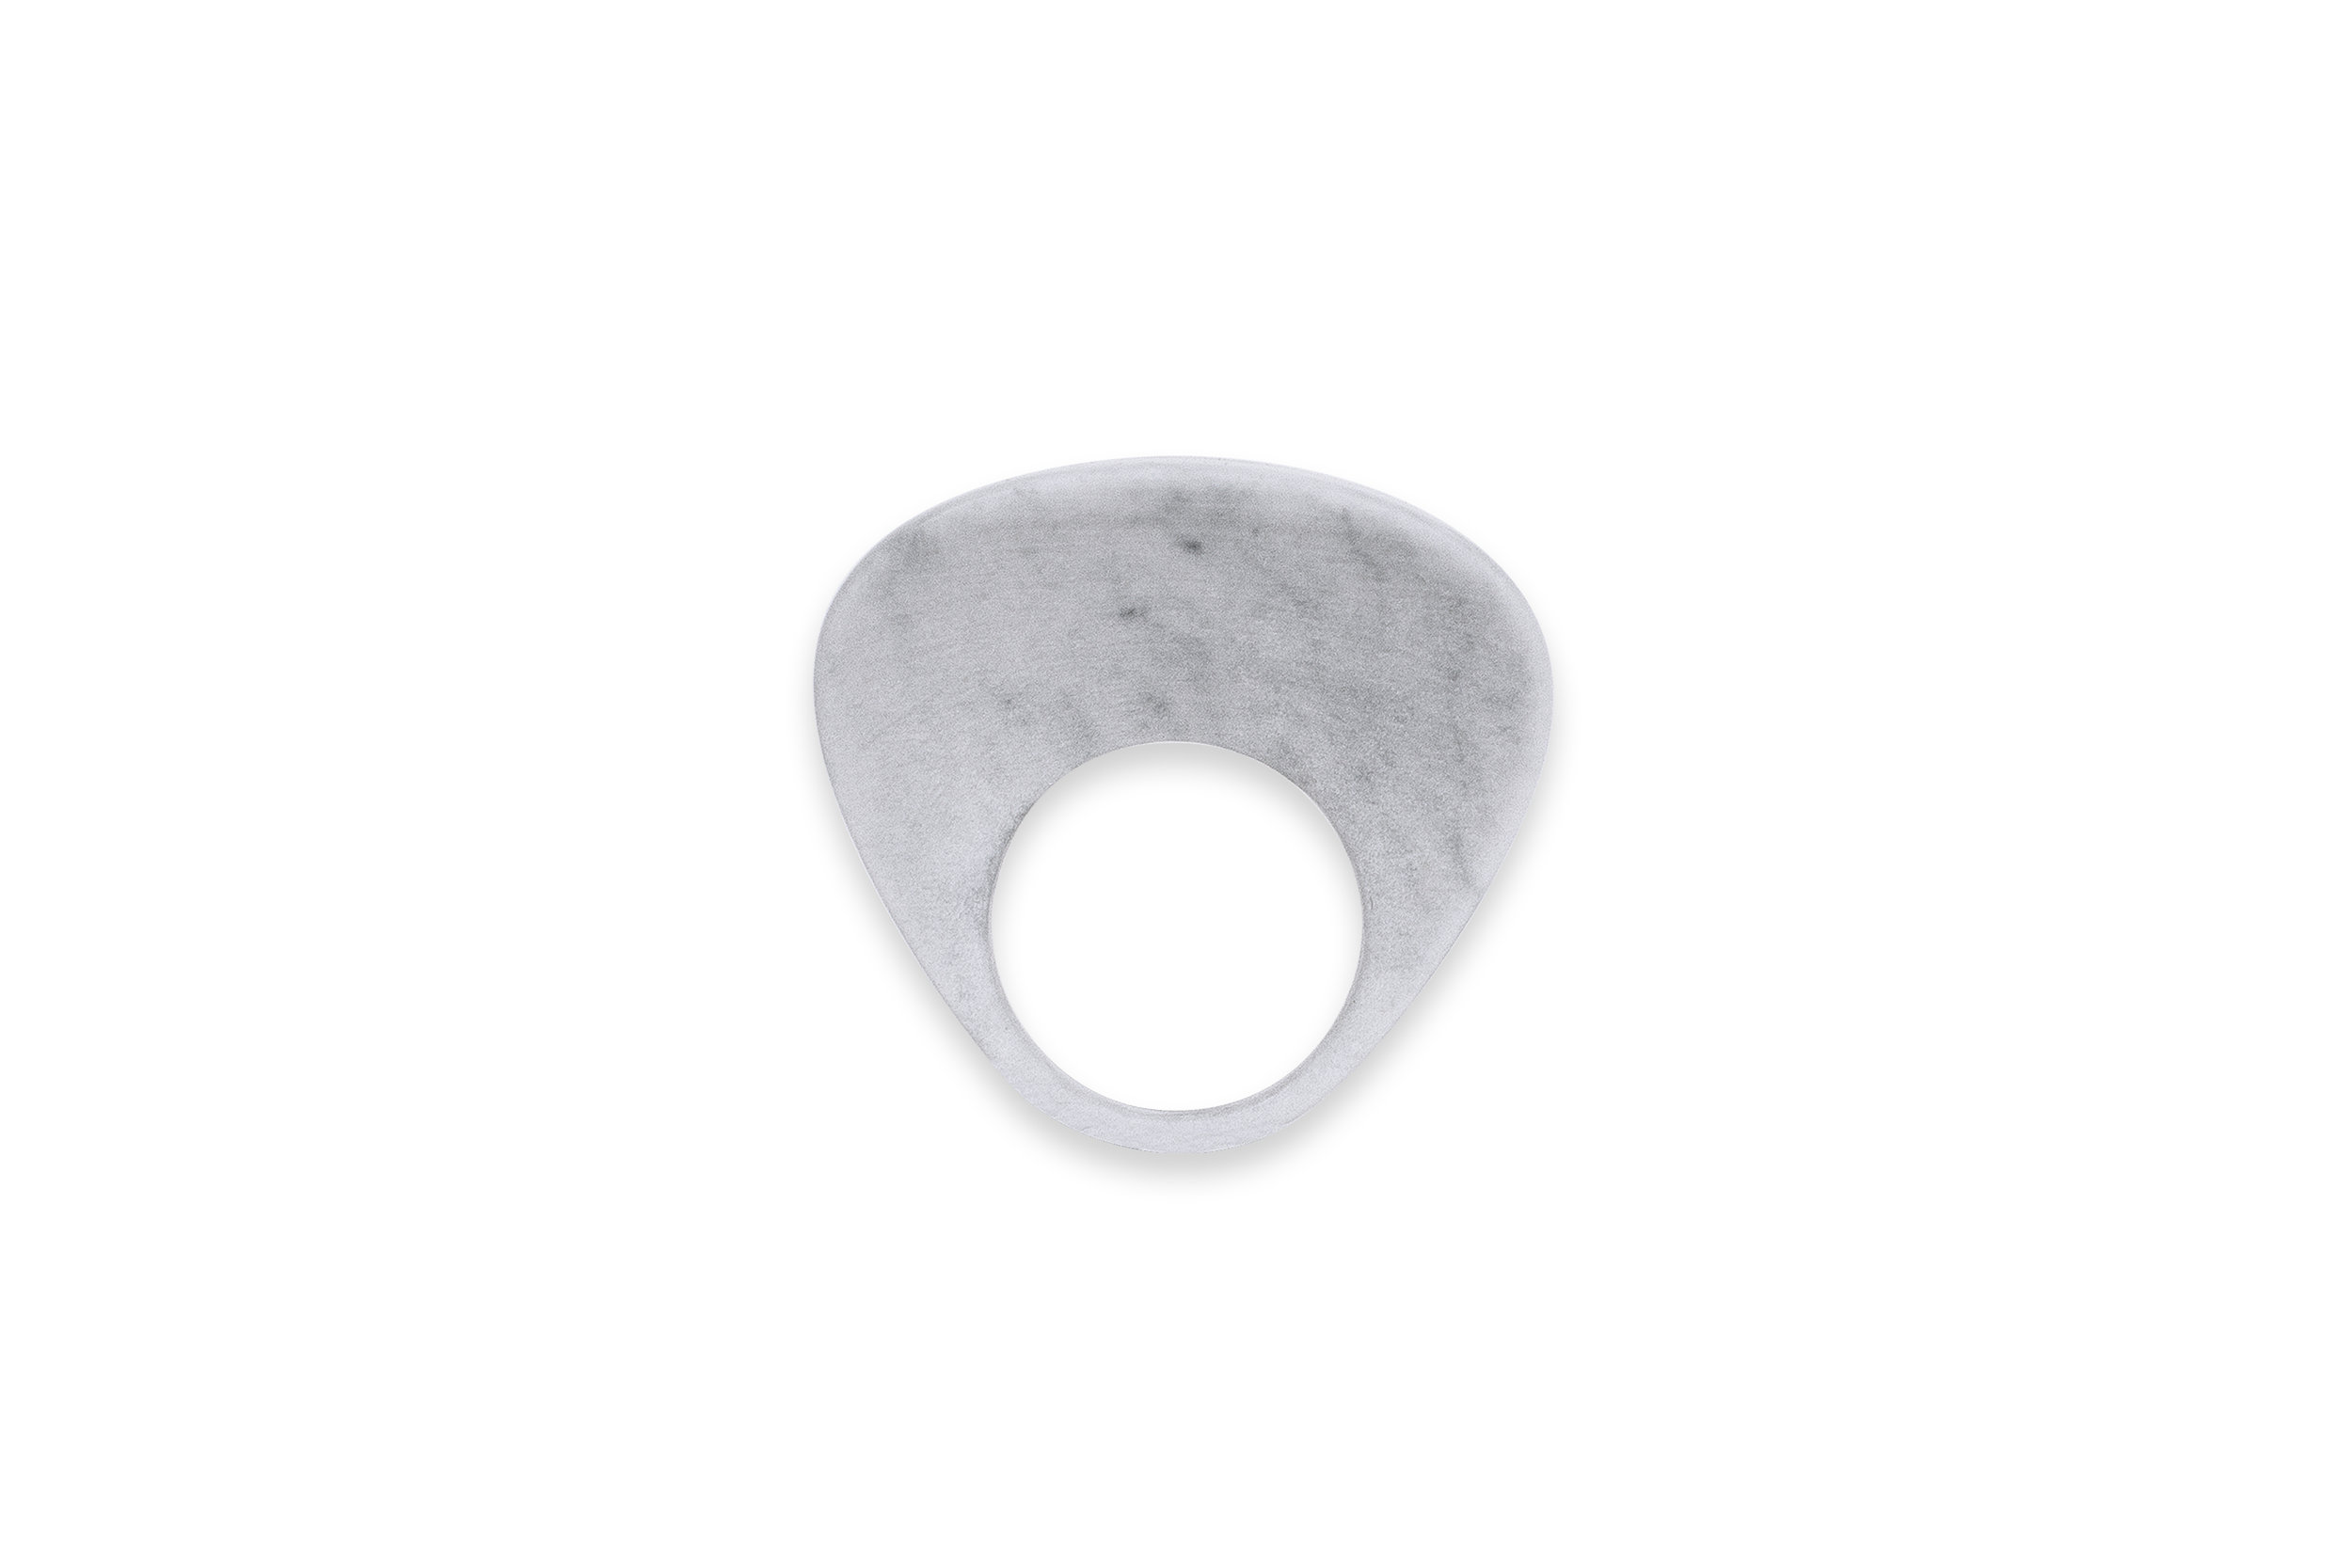 Lucina_Ring_Digital Marble_Carrara_Space Junk_2014.jpg